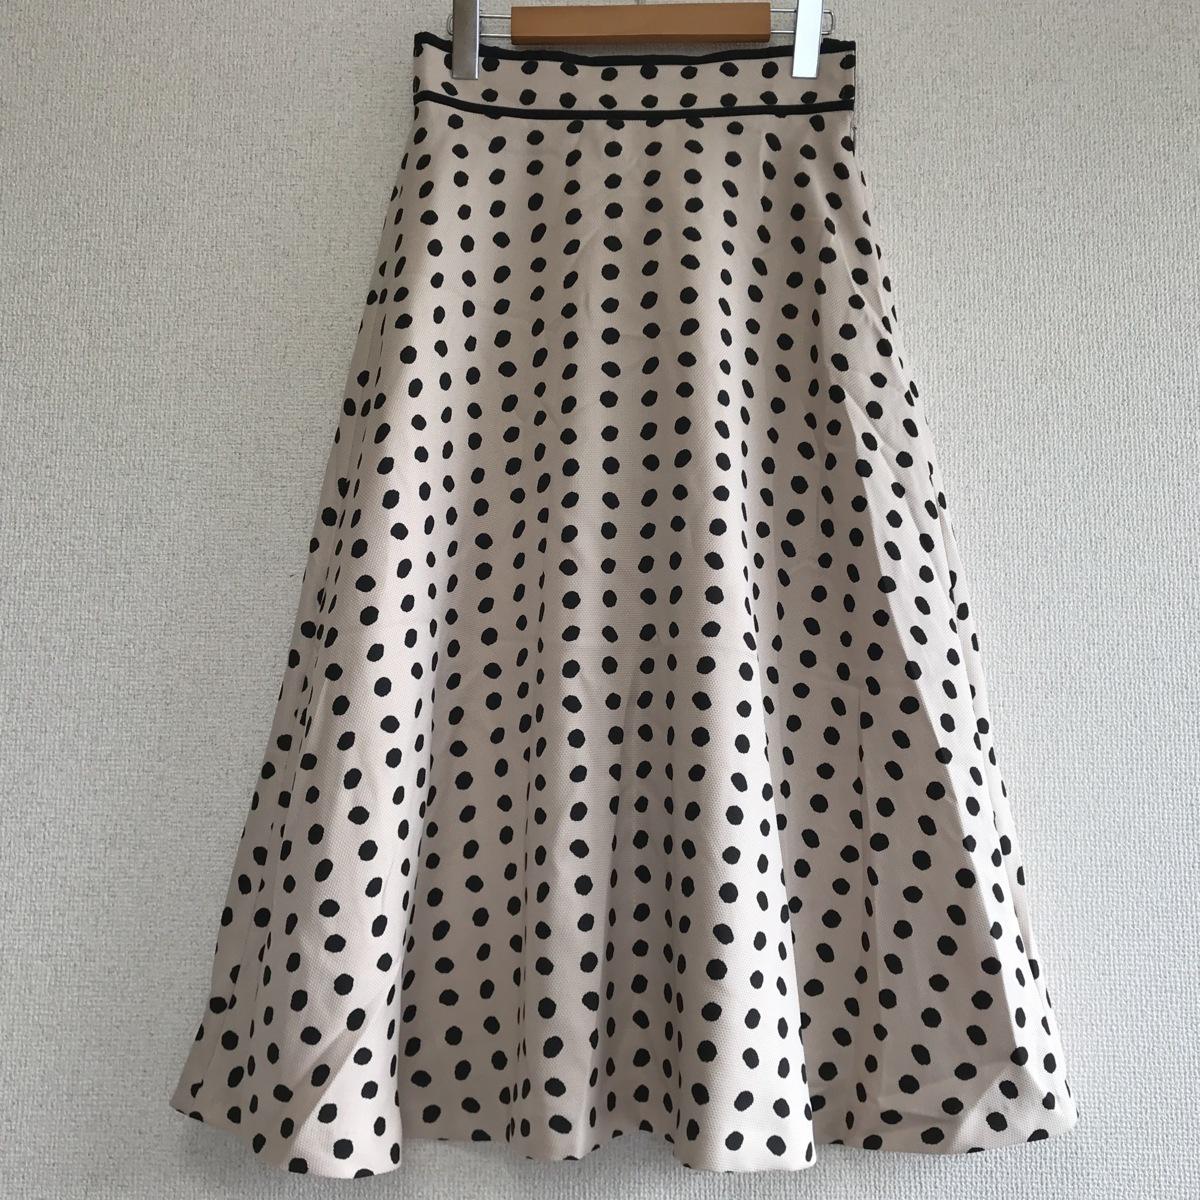 STRAWBERRY-FIELDS ストロベリーフィールズ ドットプリント ロング スカート ベージュ×黒 レディース 春夏 美品